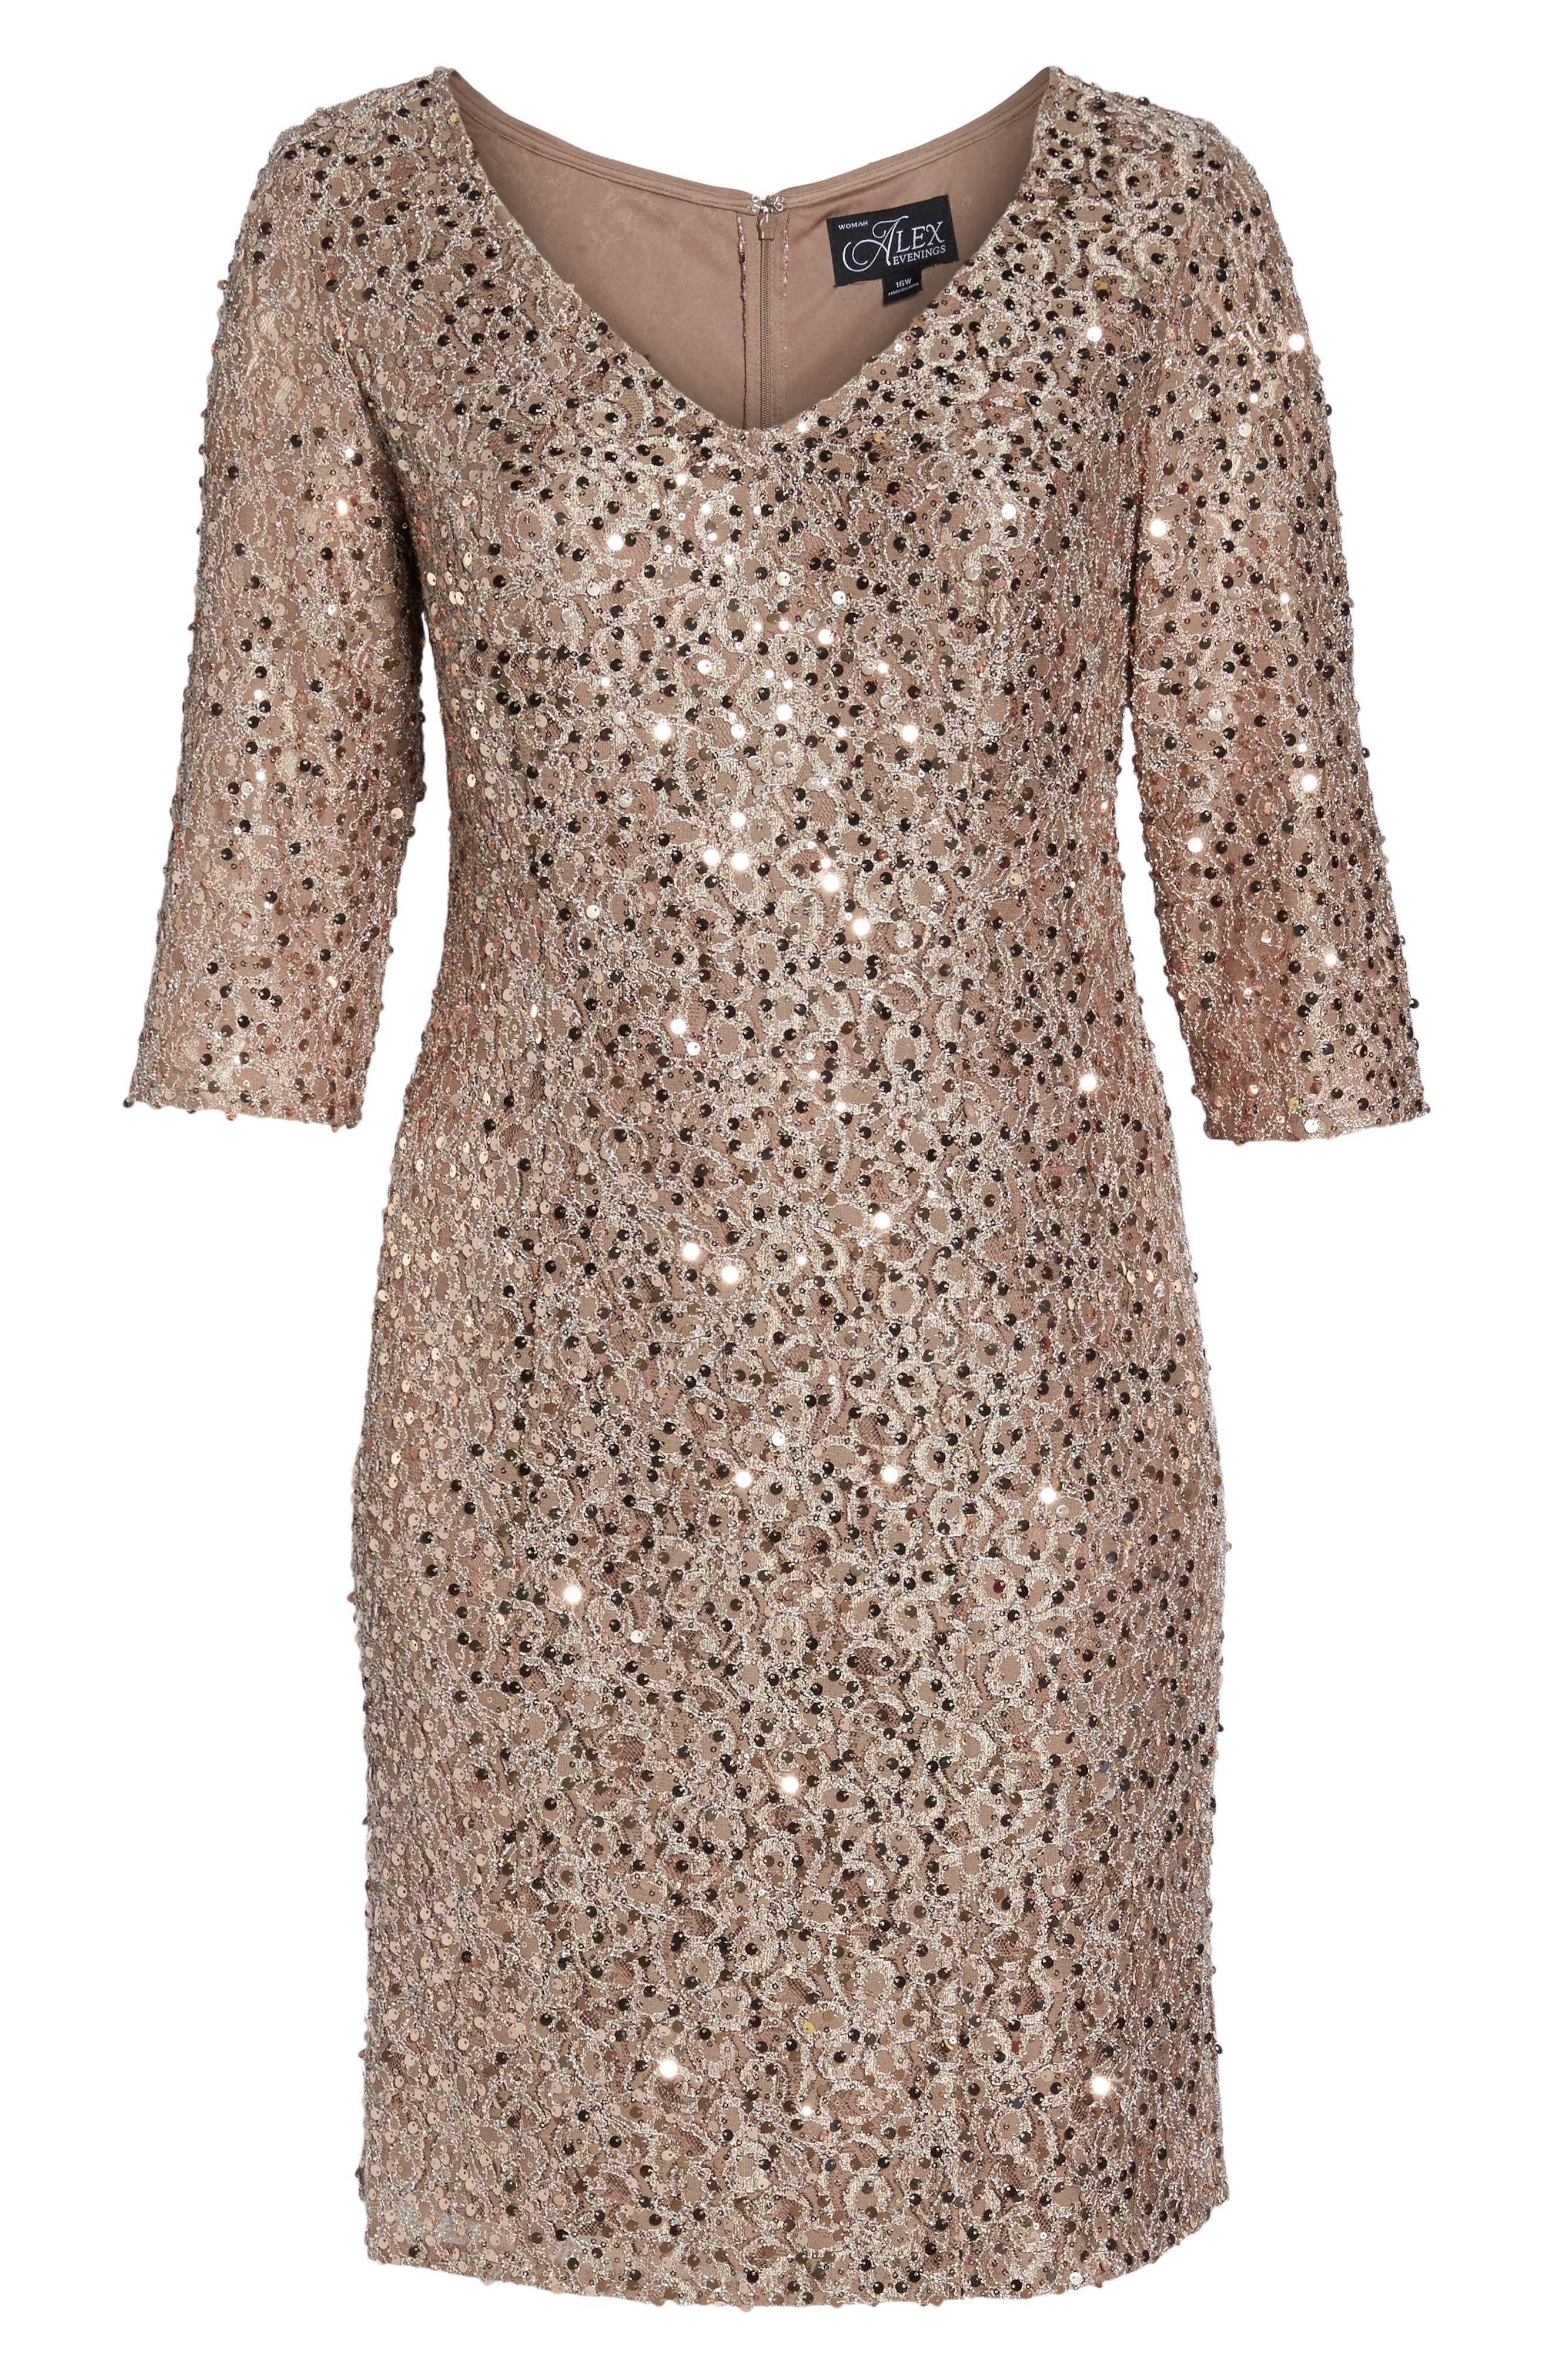 Sequin Shift Dress,                             Alternate thumbnail 6, color,                             Taupe